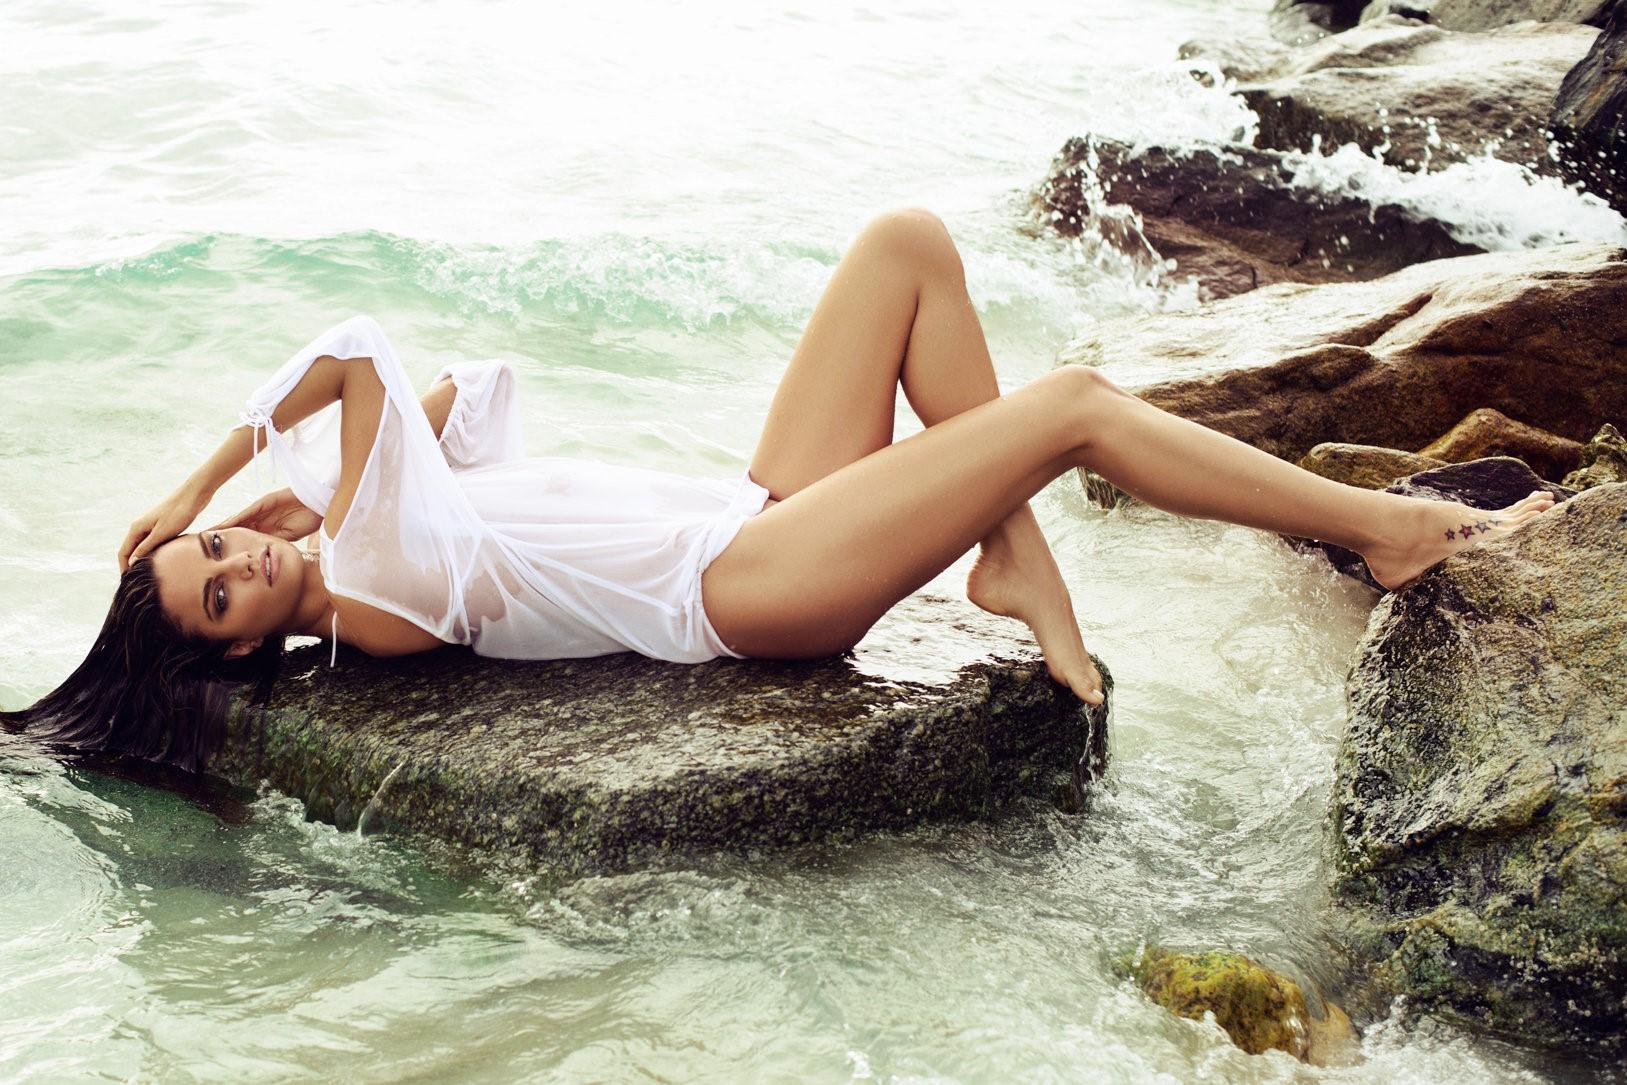 Beauty Body 2013 - Barbara Fialho By Danny Cardozo